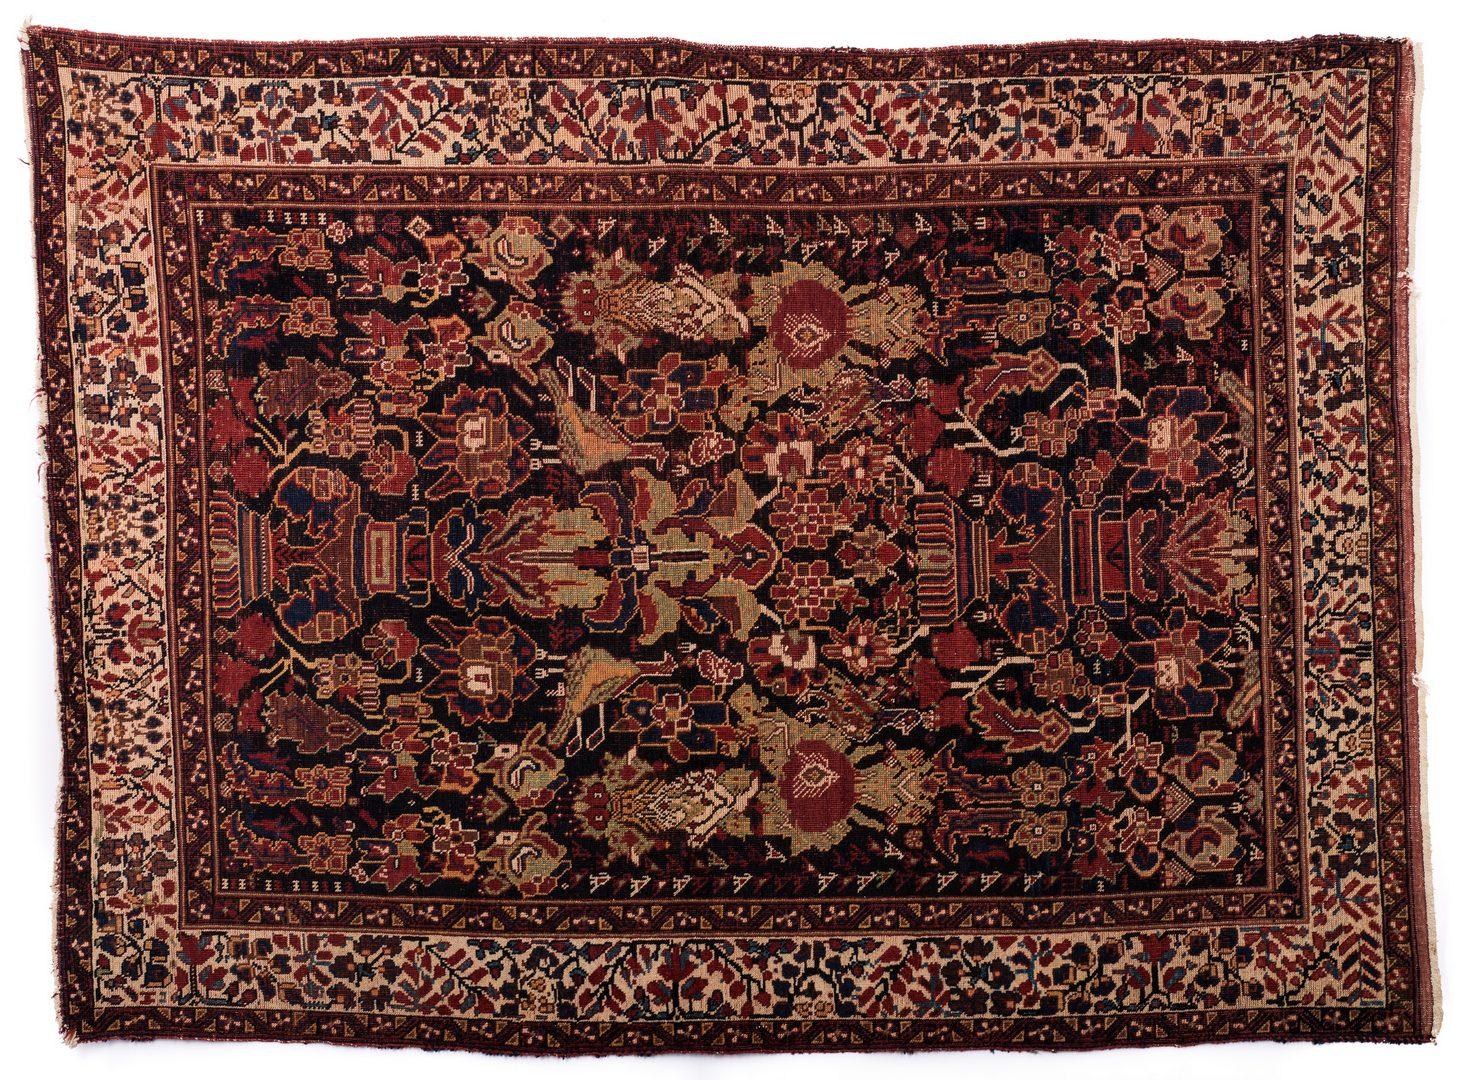 Lot 855: Antique Persian Afshar Area Rug